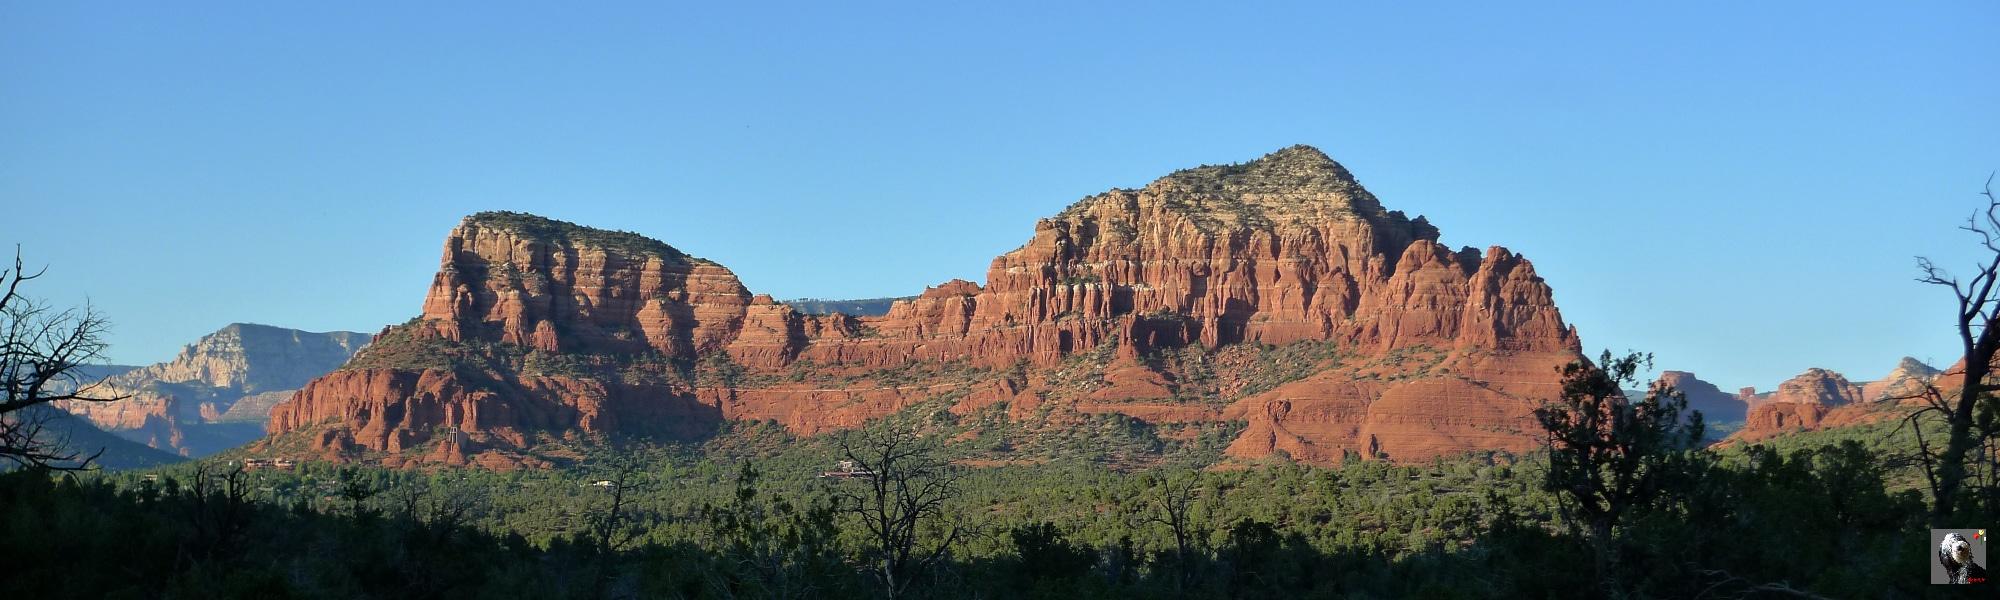 L'Arizona.